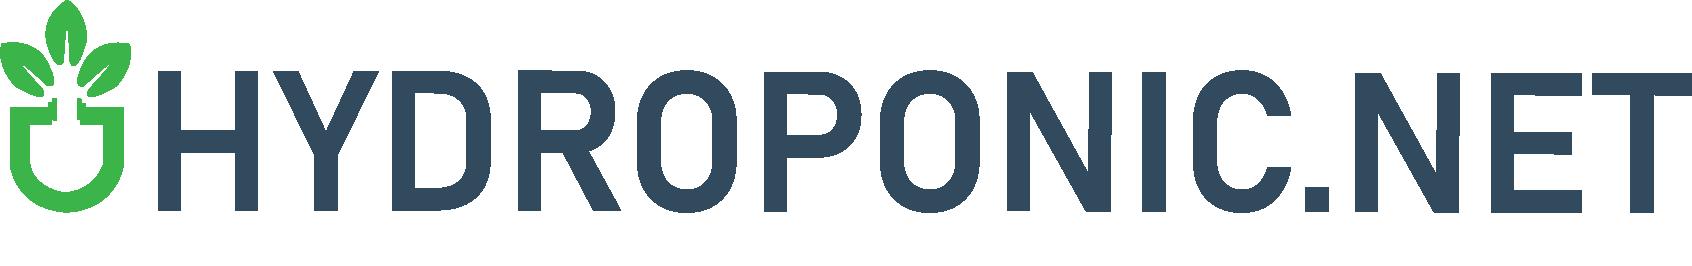 Hydroponic.net